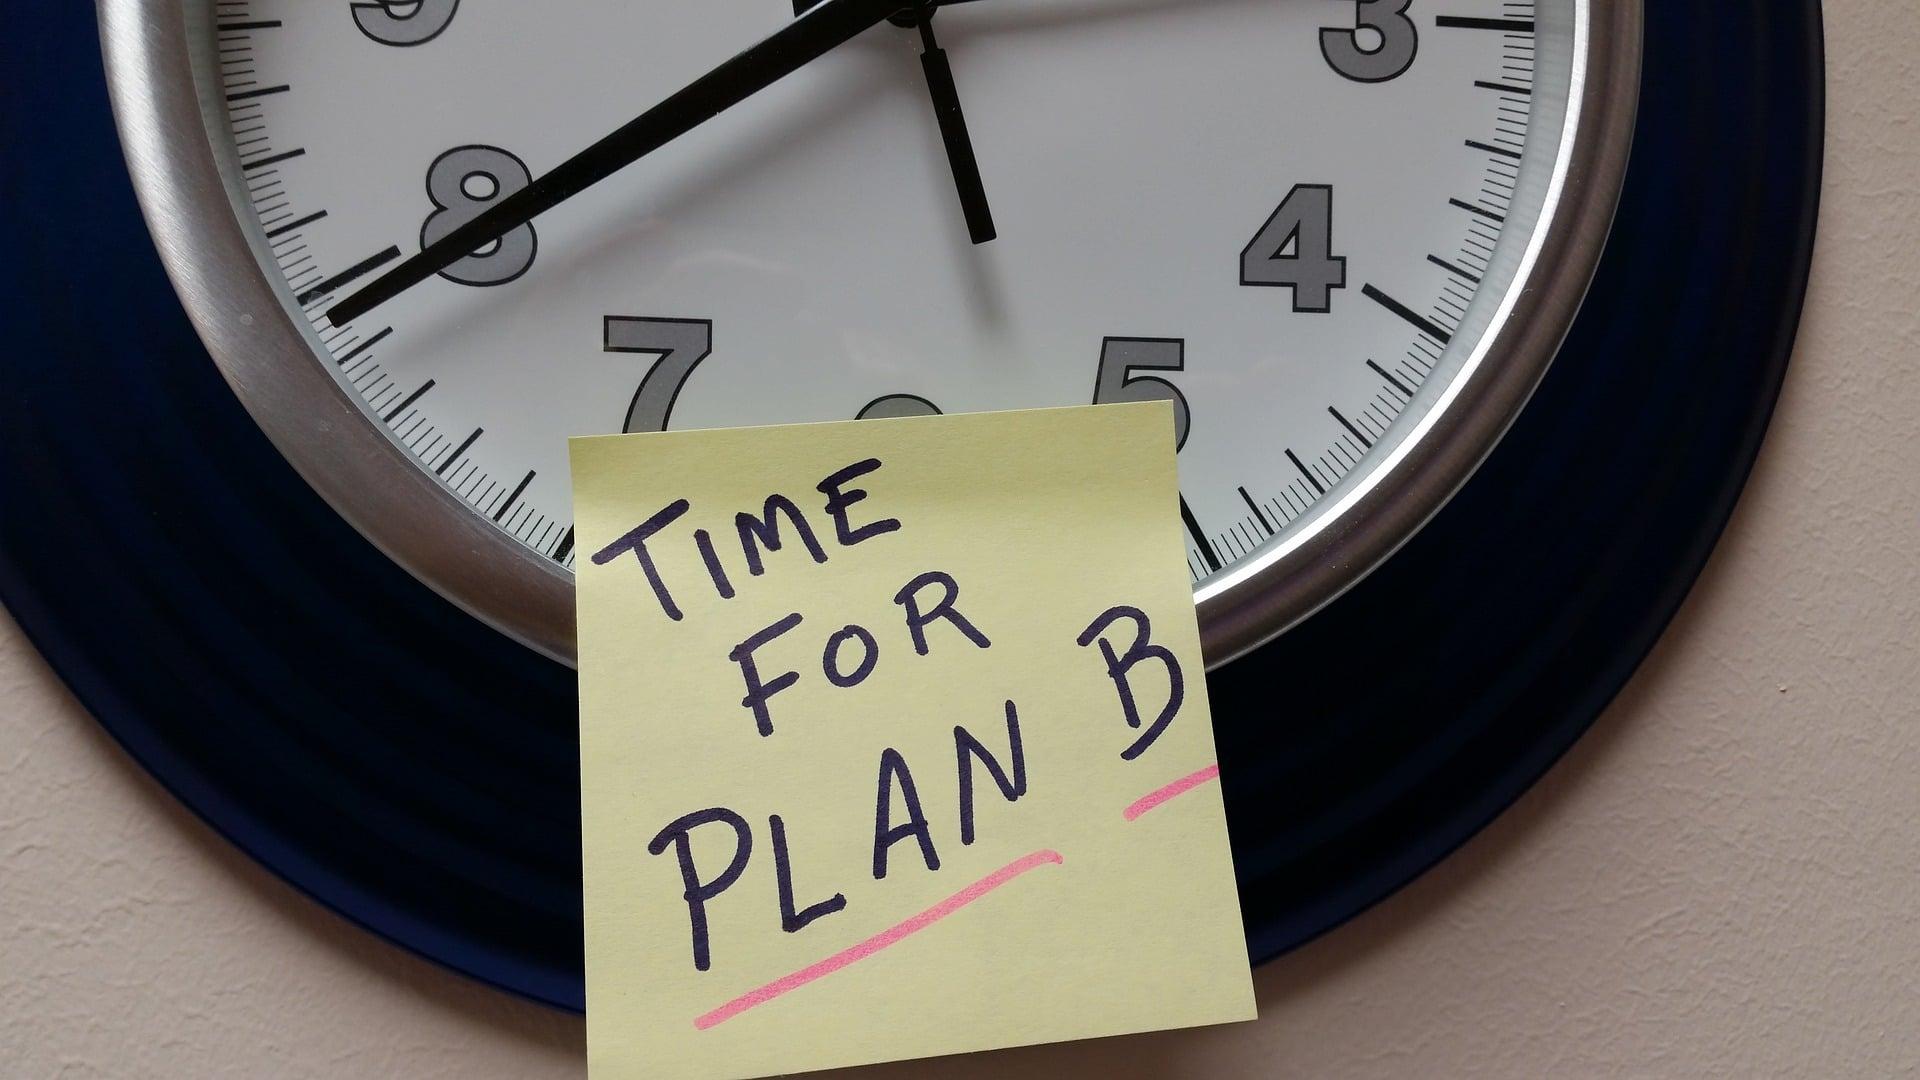 Tid for plan B